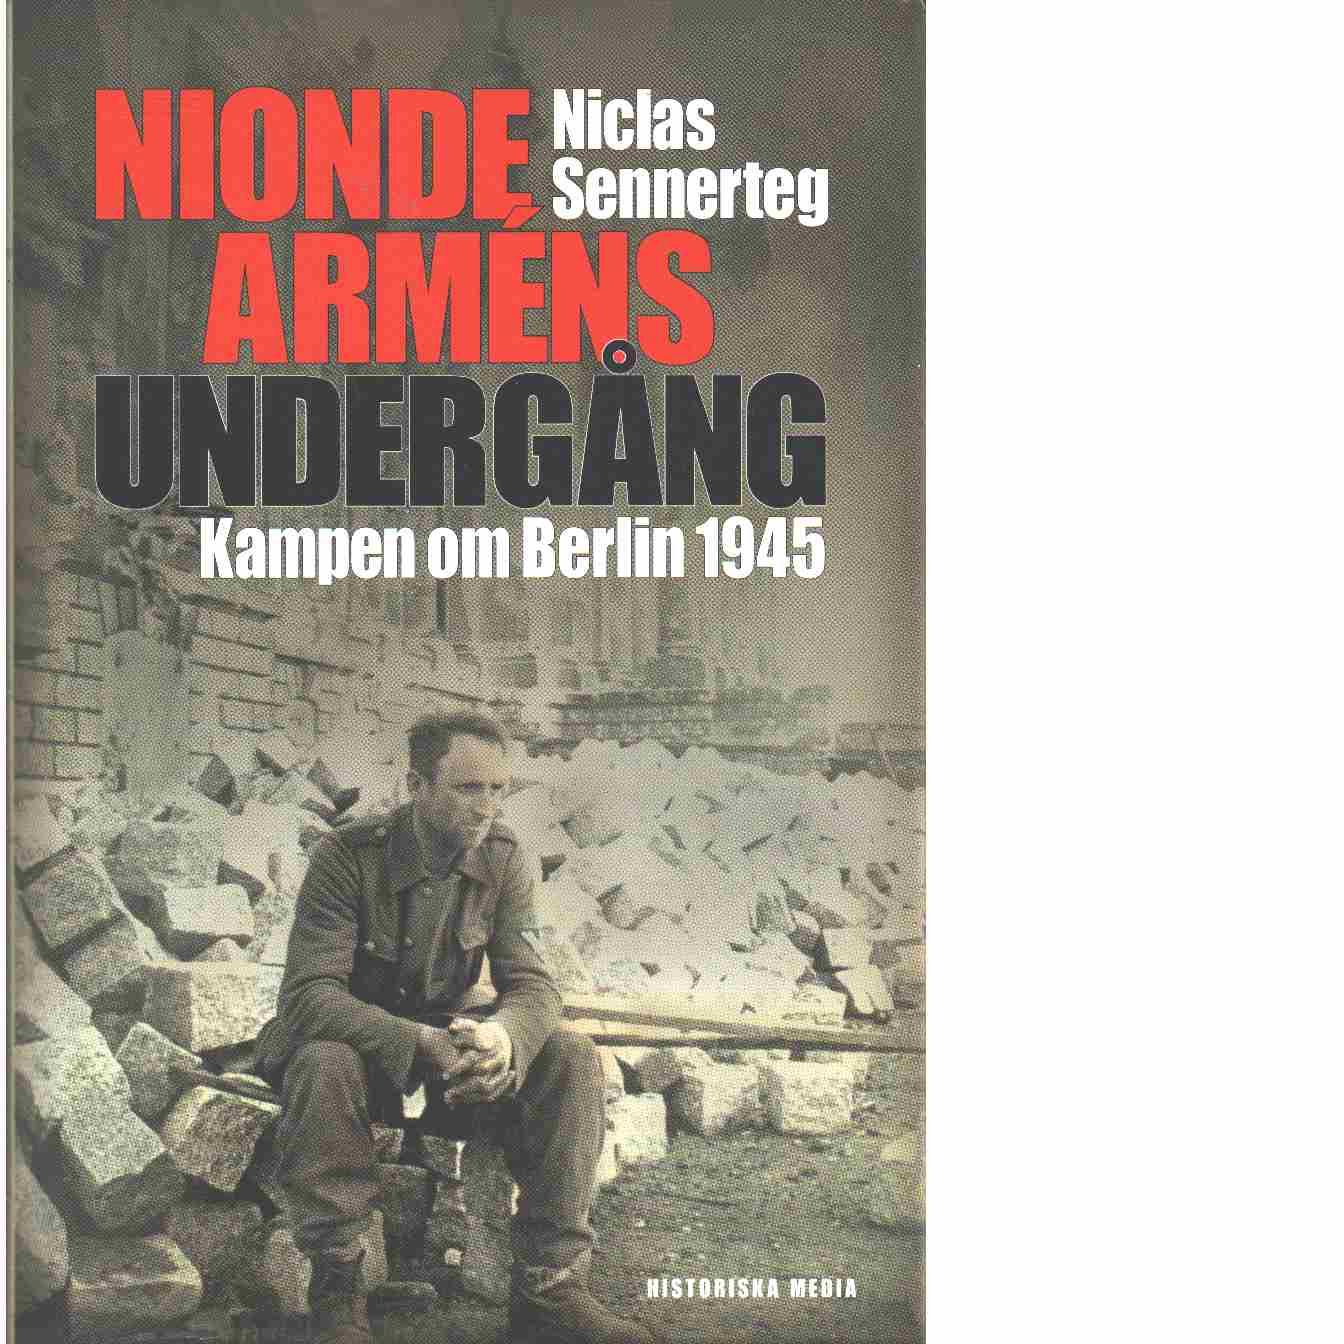 Nionde arméns undergång : kampen om Berlin 1945 - Sennerteg, Niclas